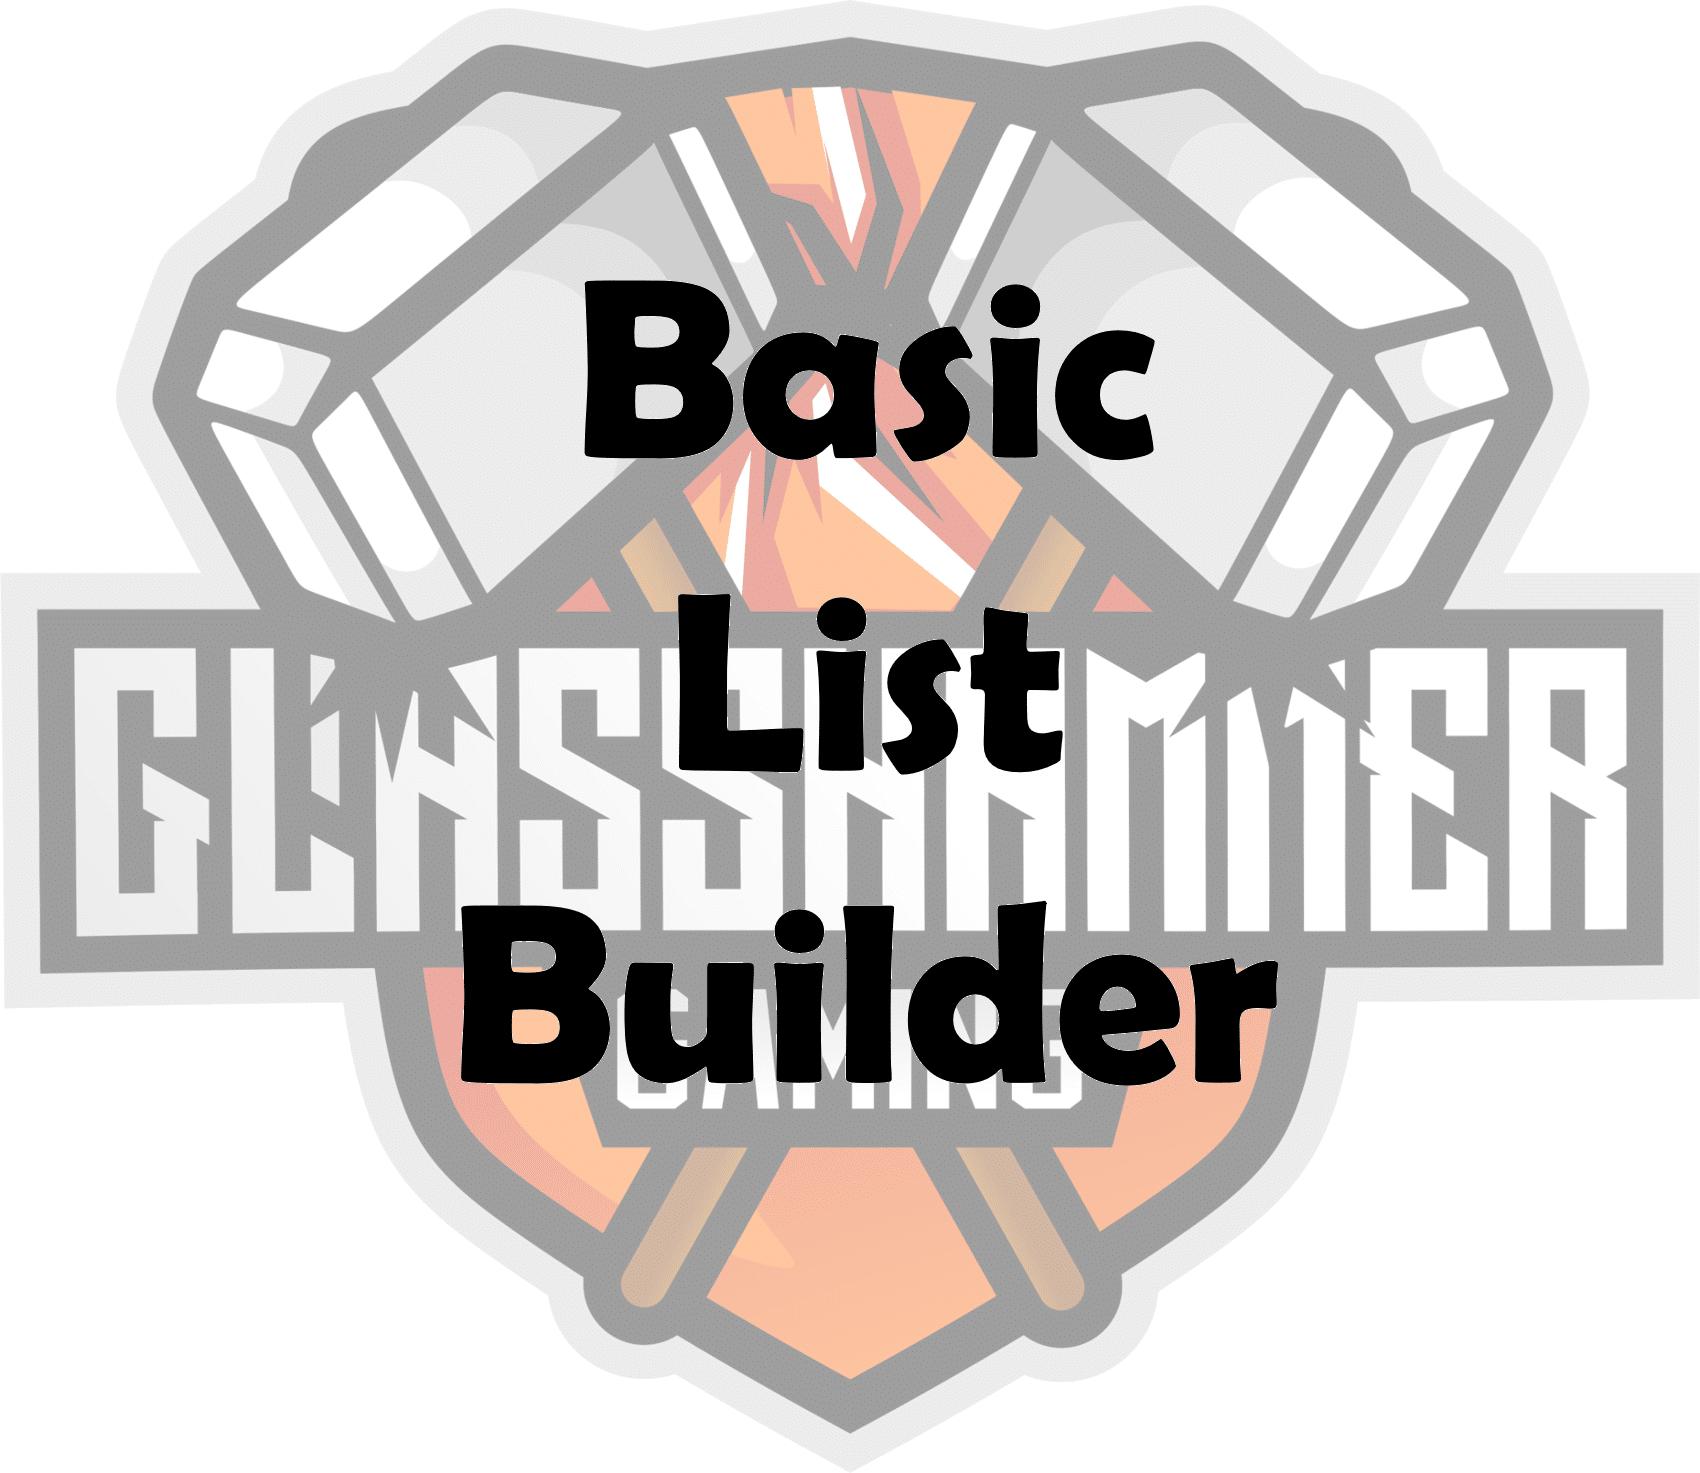 Basic List Builder Image